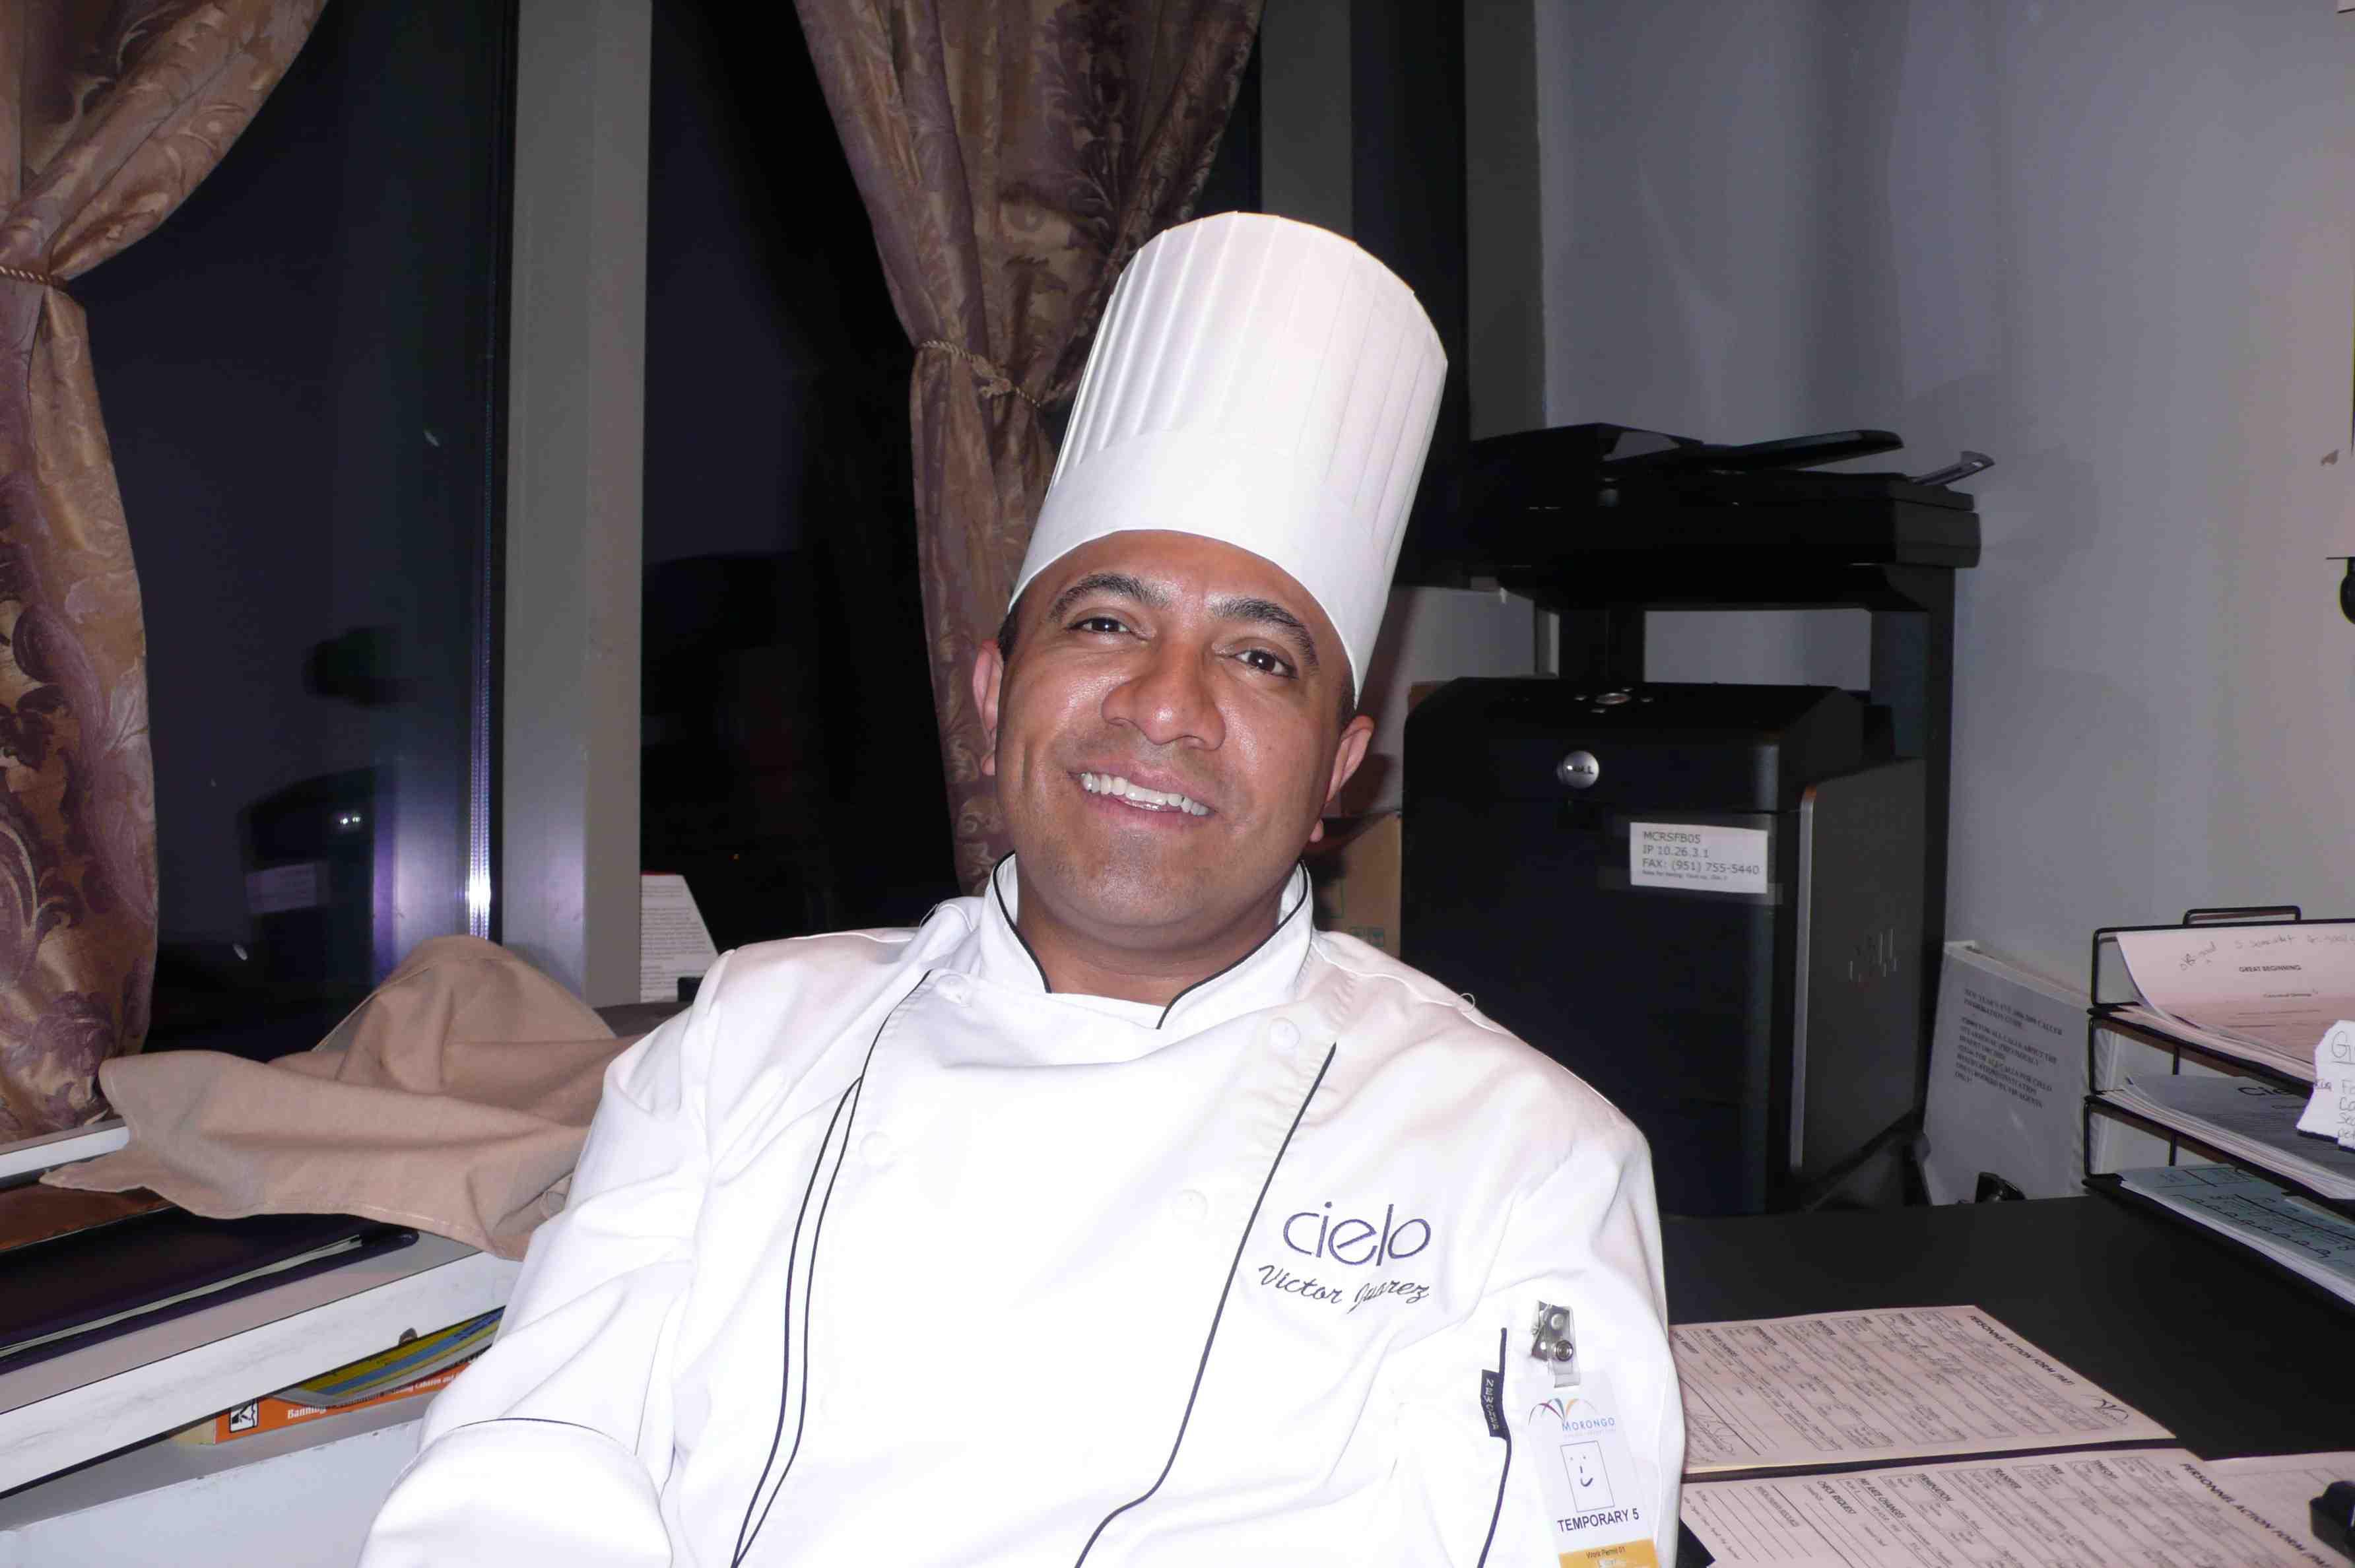 Chef de Cuisine Victor Juarez